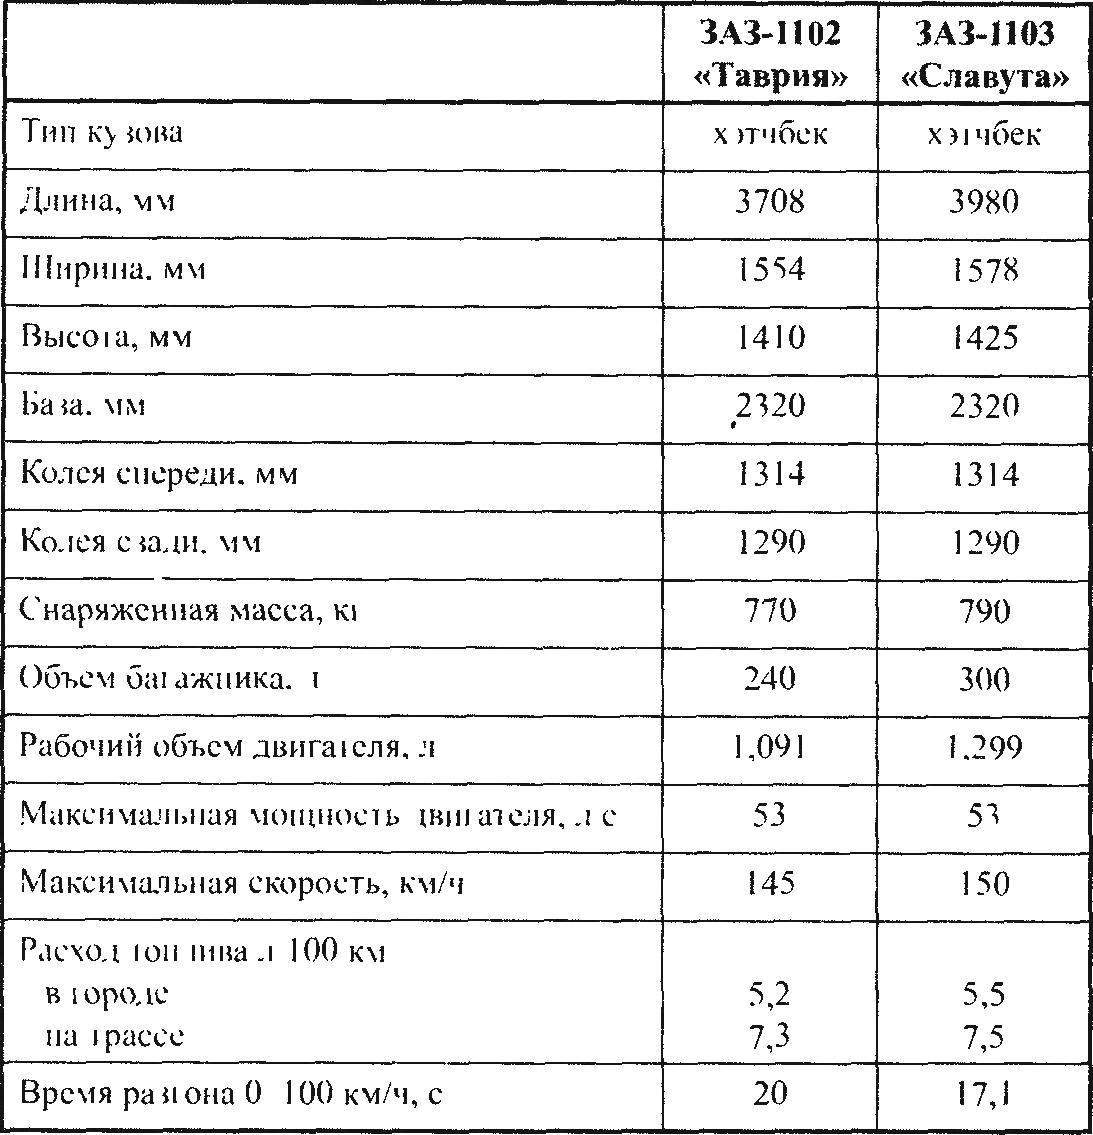 Технические характеристики автомобилей «Таврия» и «Славута»